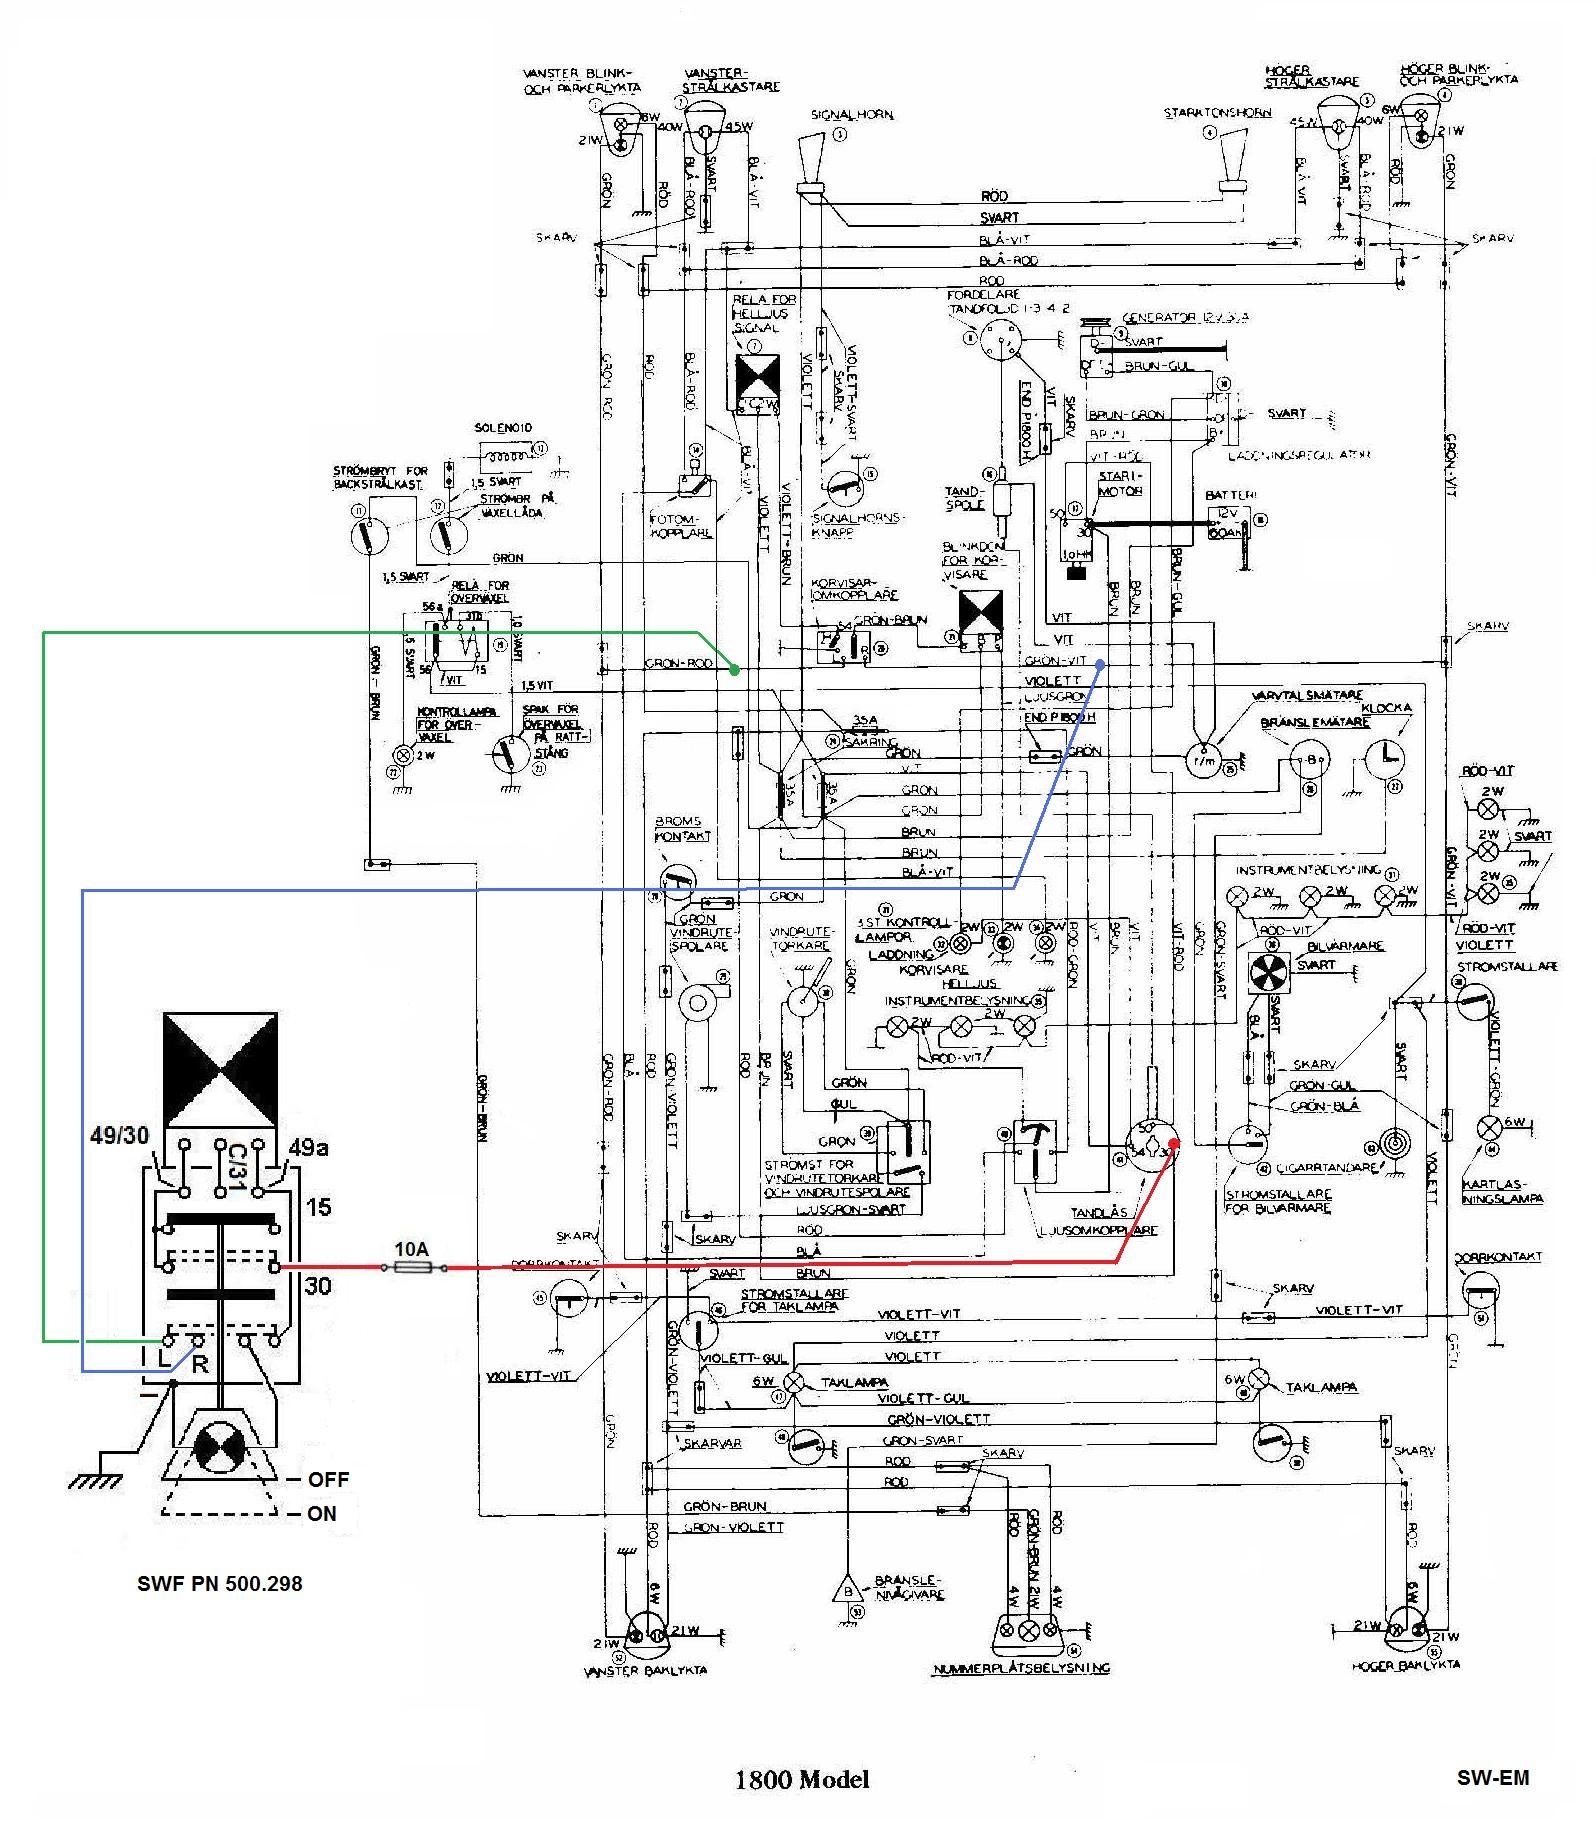 emergency key switch wiring diagram 92 honda prelude stereo sw em flasher